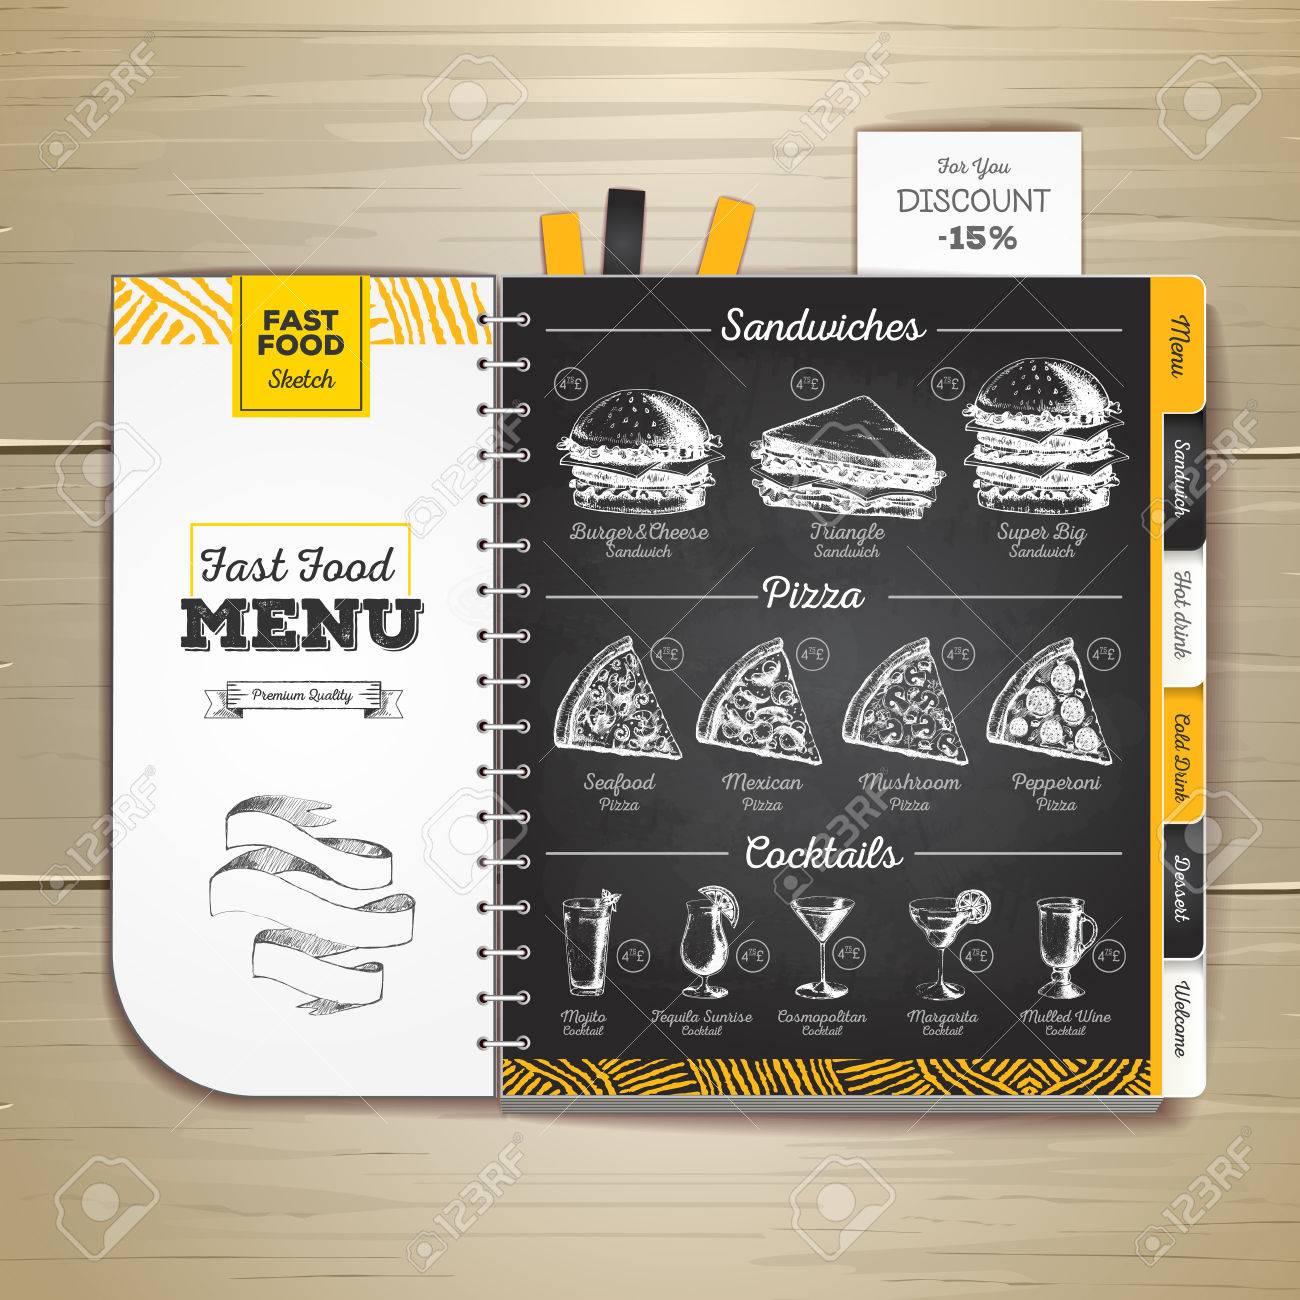 1300x1300 Vintage Chalk Drawing Fast Food Menu. Sandwich Sketch Corporate